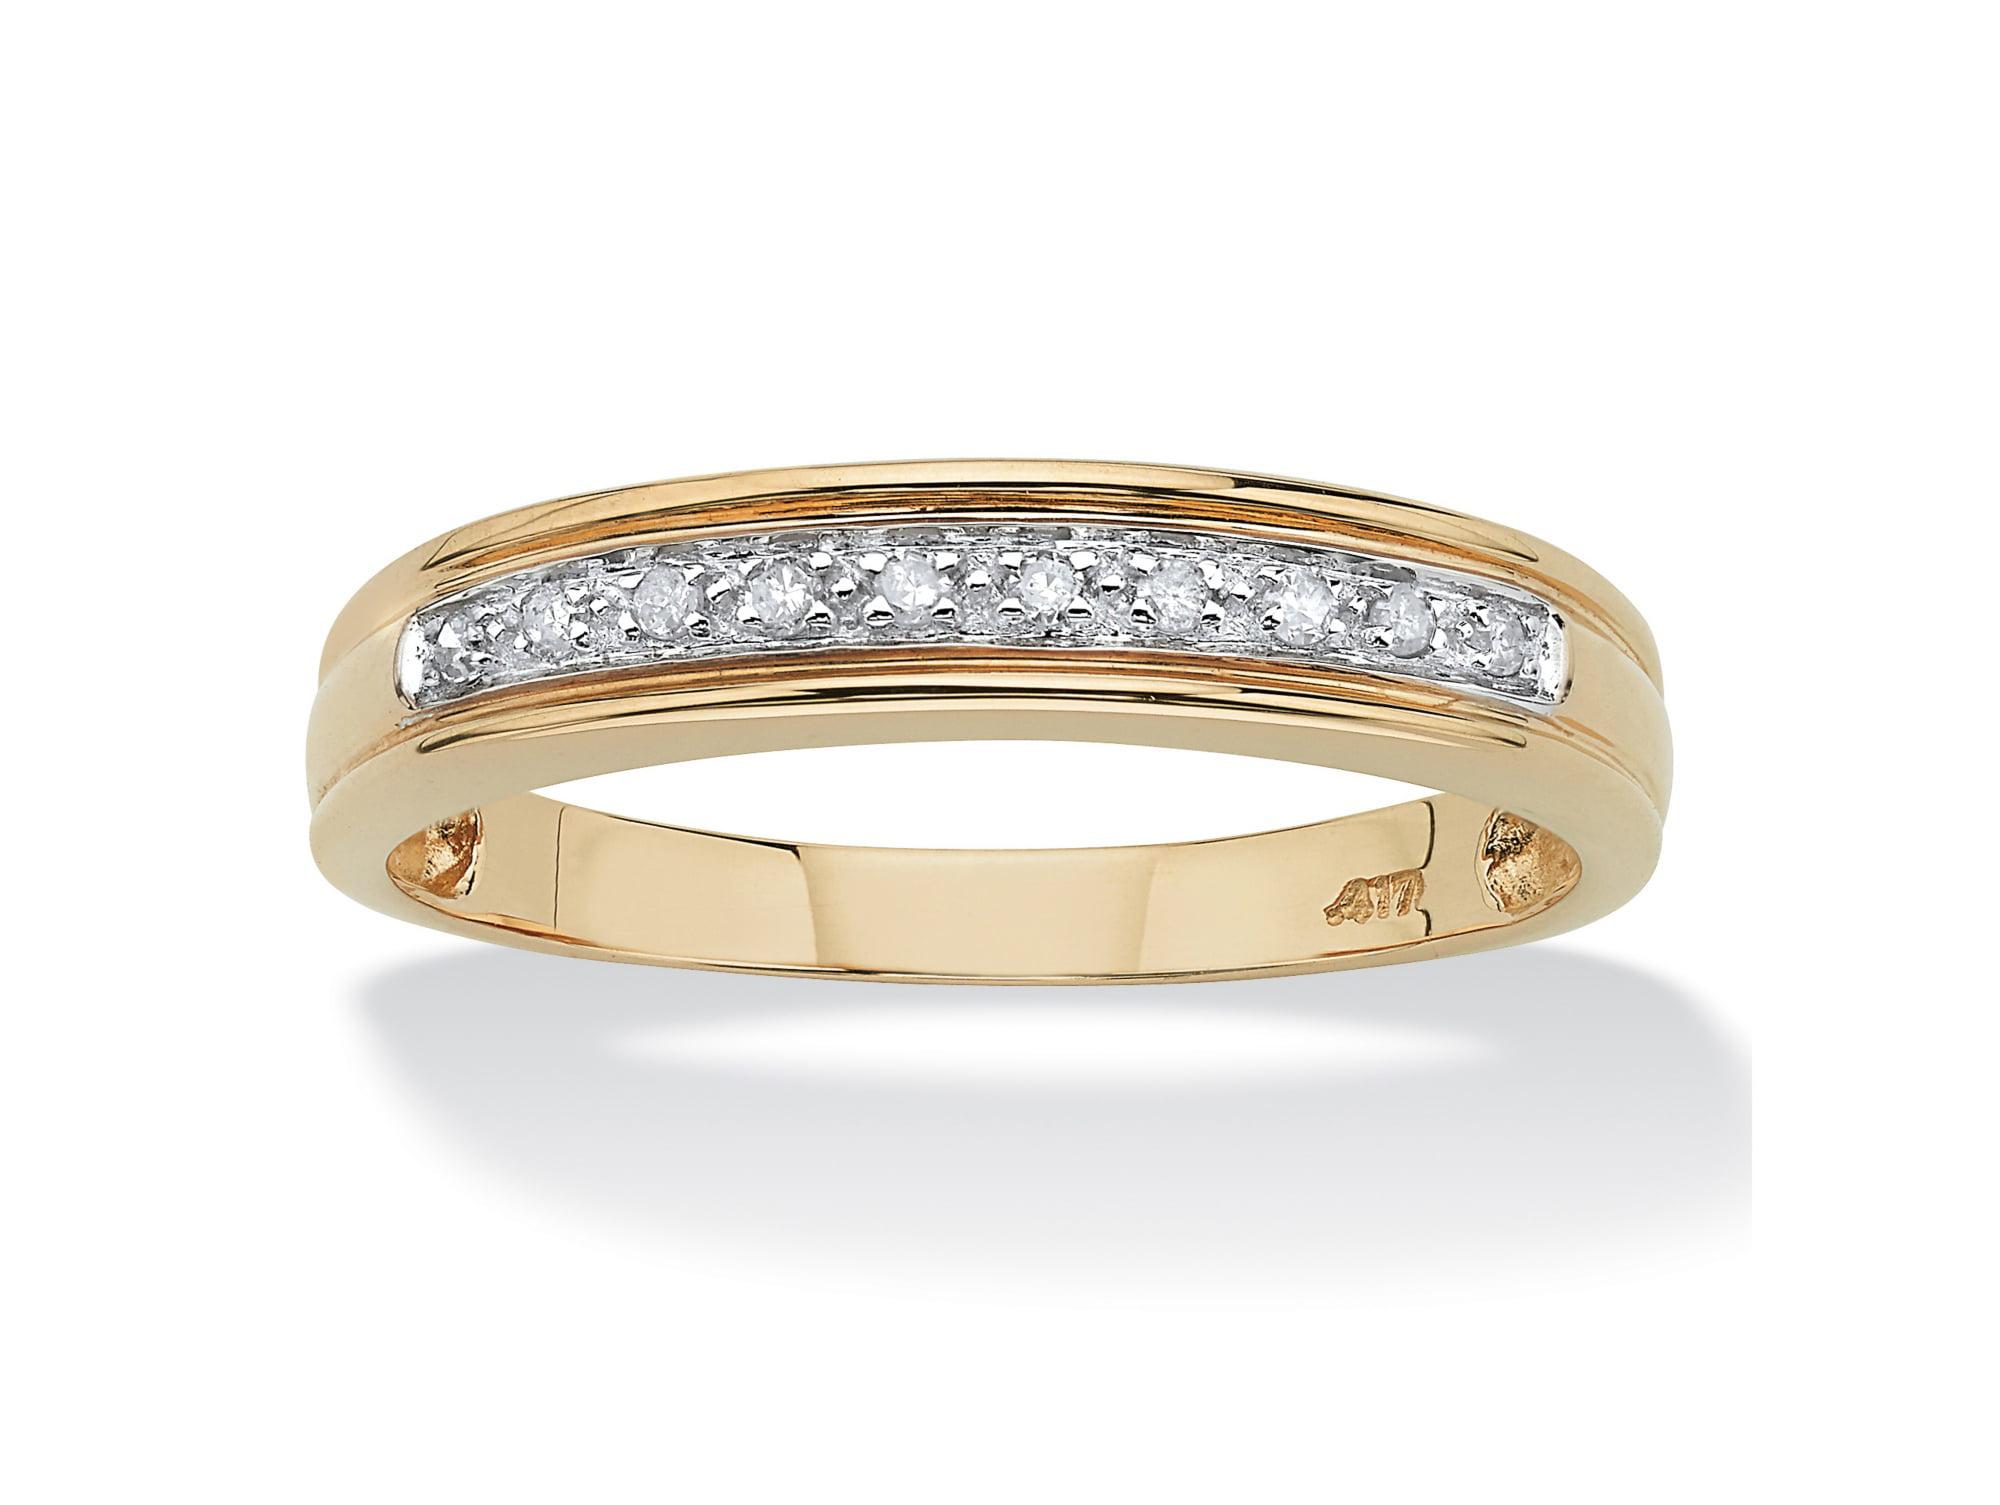 Men's 1 10 TCW Round Diamond 10k Yellow Gold Anniversary Ring Wedding Band by PalmBeach Jewelry